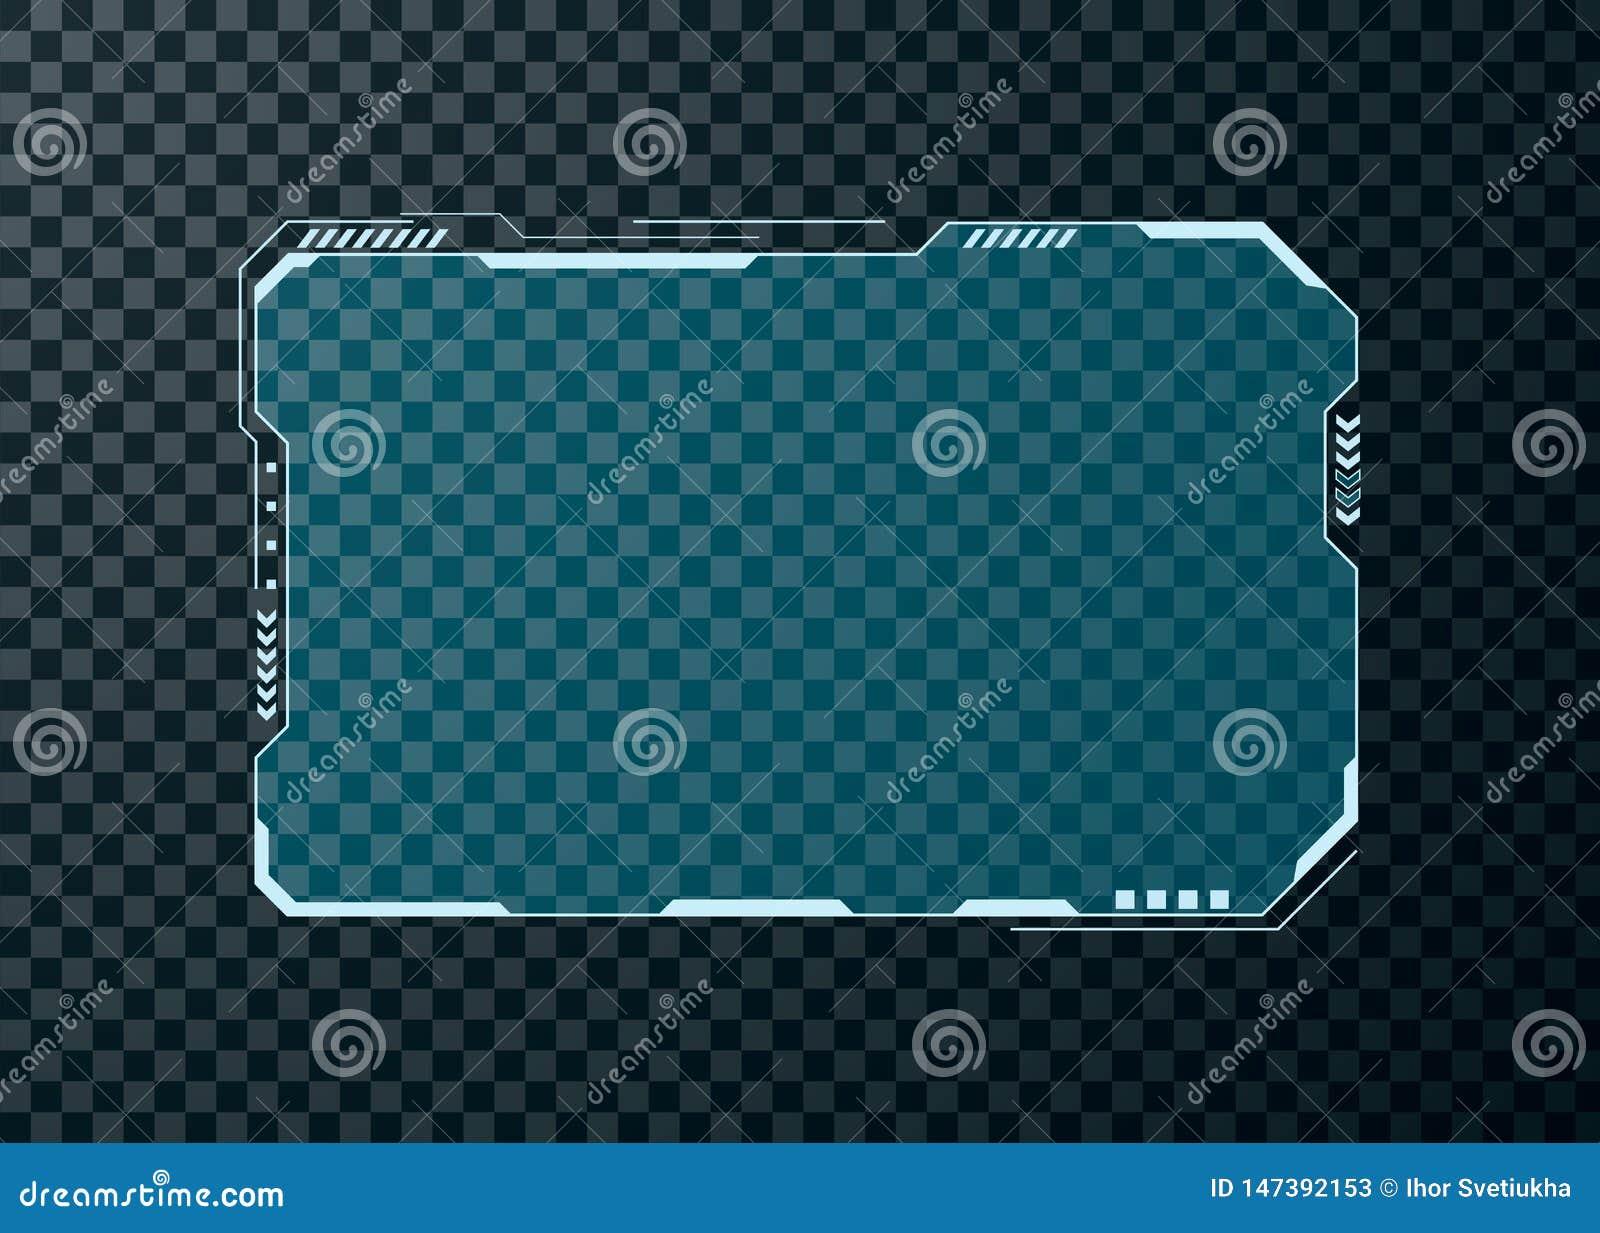 HUD未来派用户界面屏幕组成元素 抽象控制板布局设计 科学幻想小说真正技术显示 ??